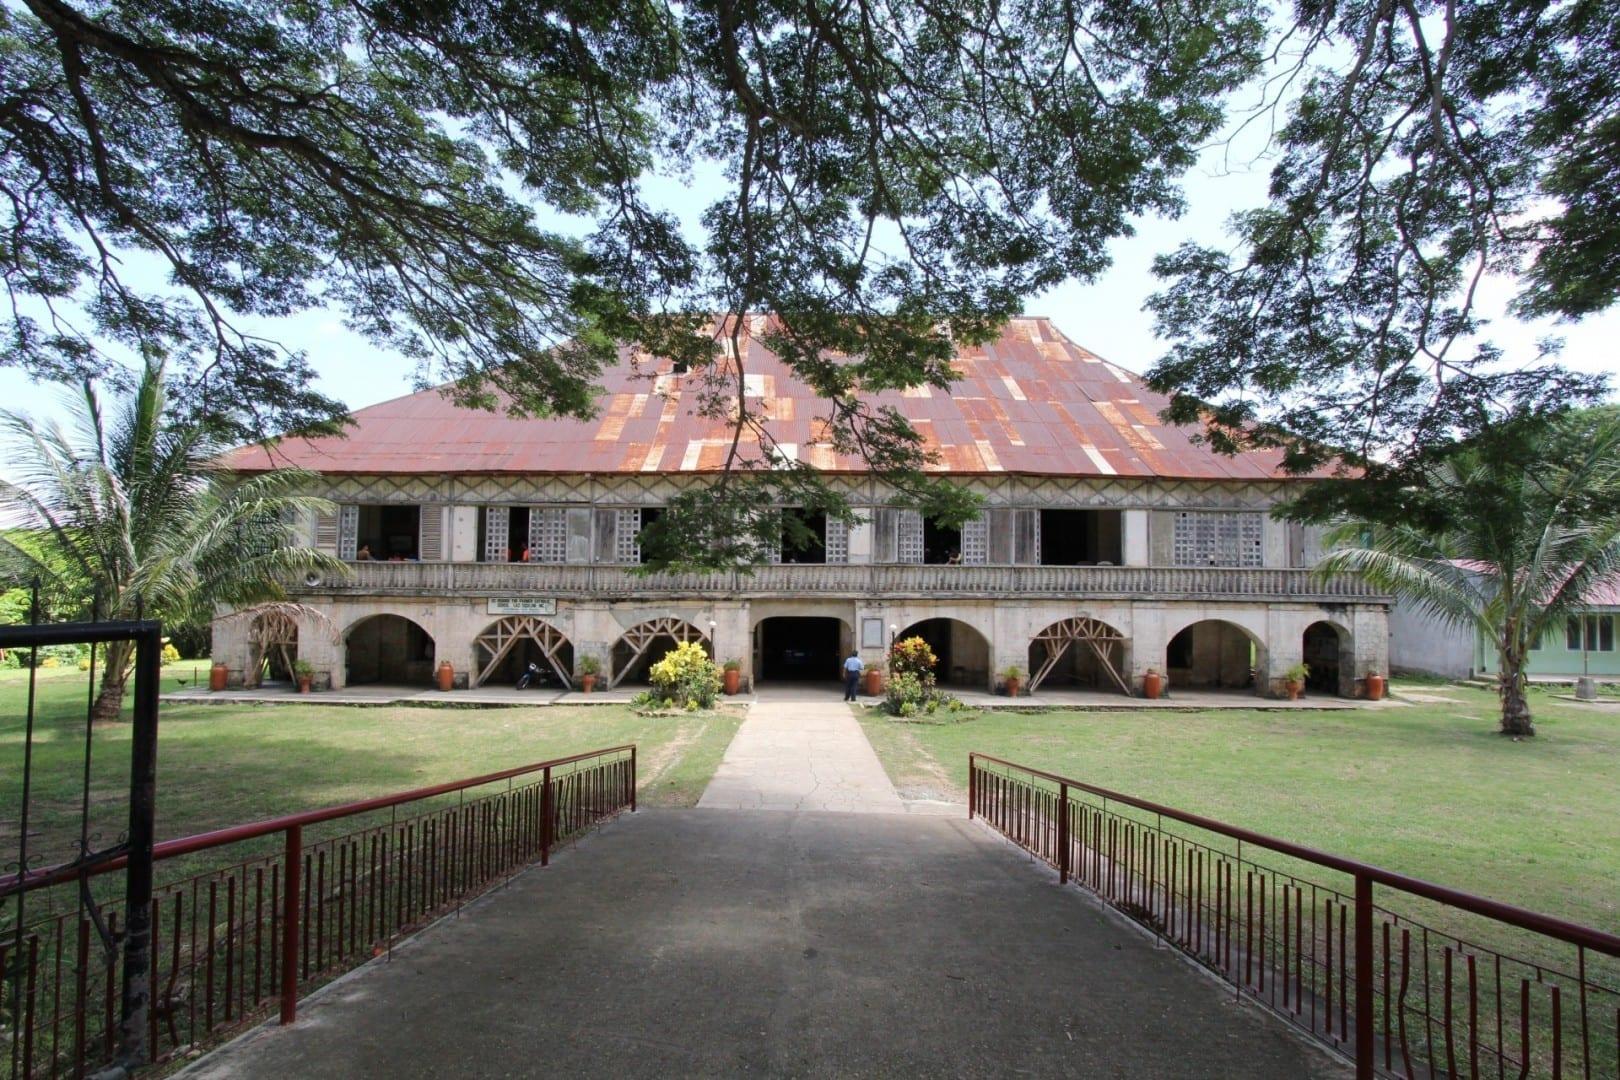 San Isidro Labrador Convent Siquijor Filipinas